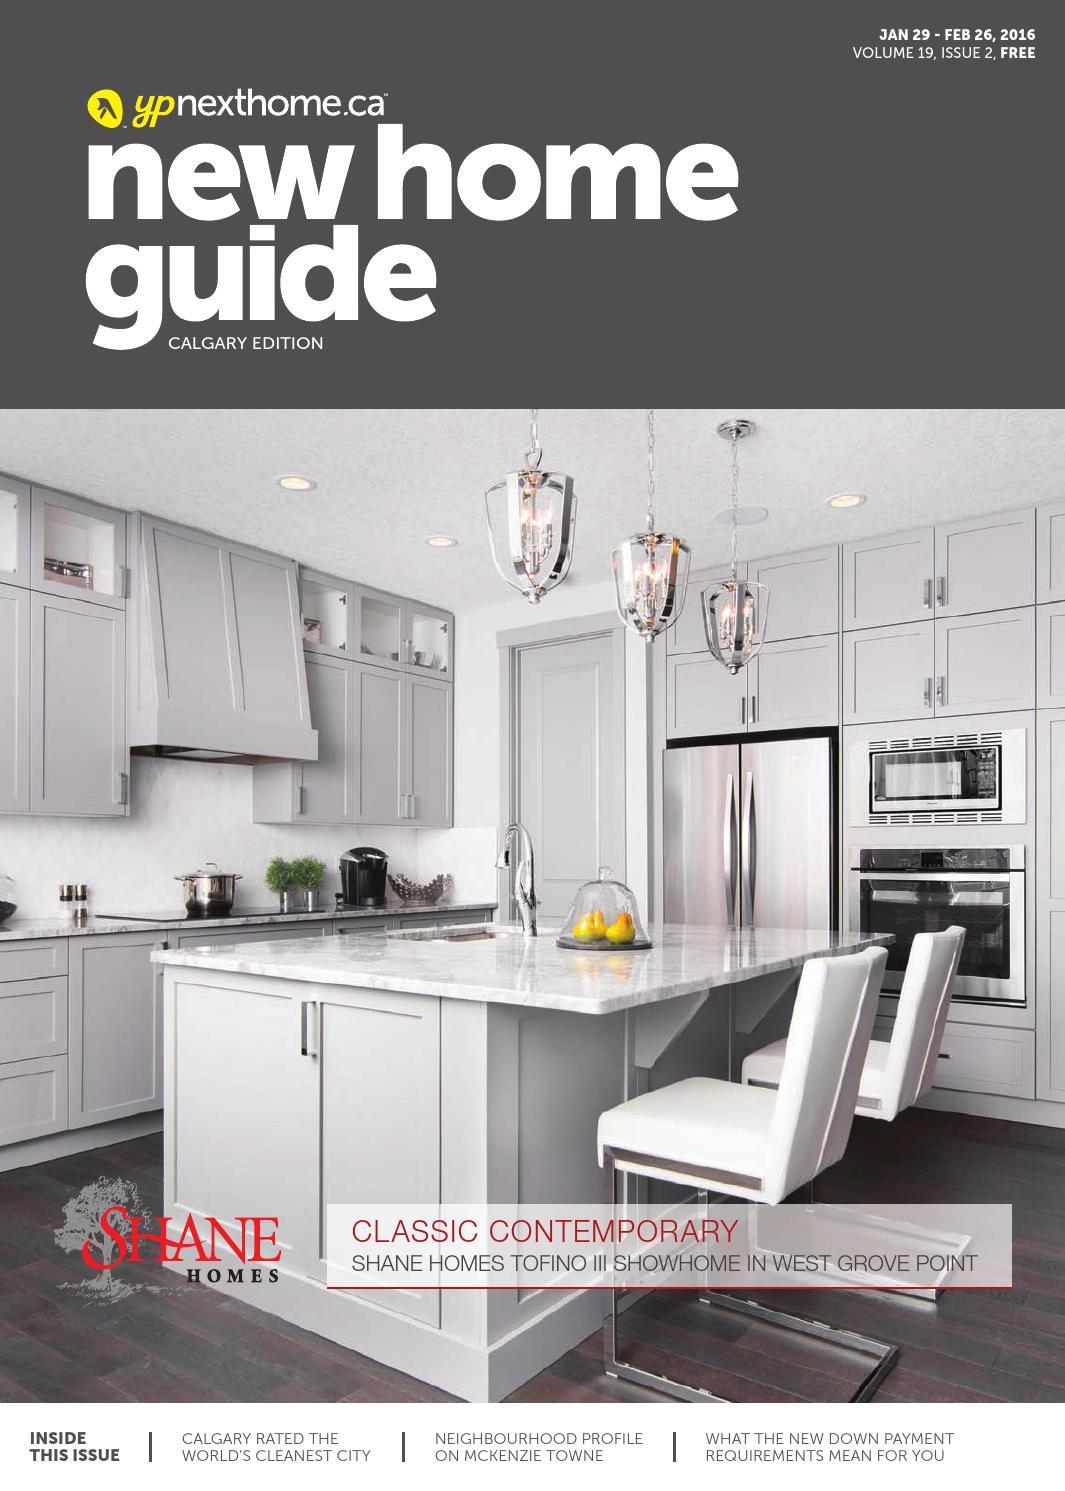 Calgary New Home Guide Jan 29 2016 by NextHome issuu